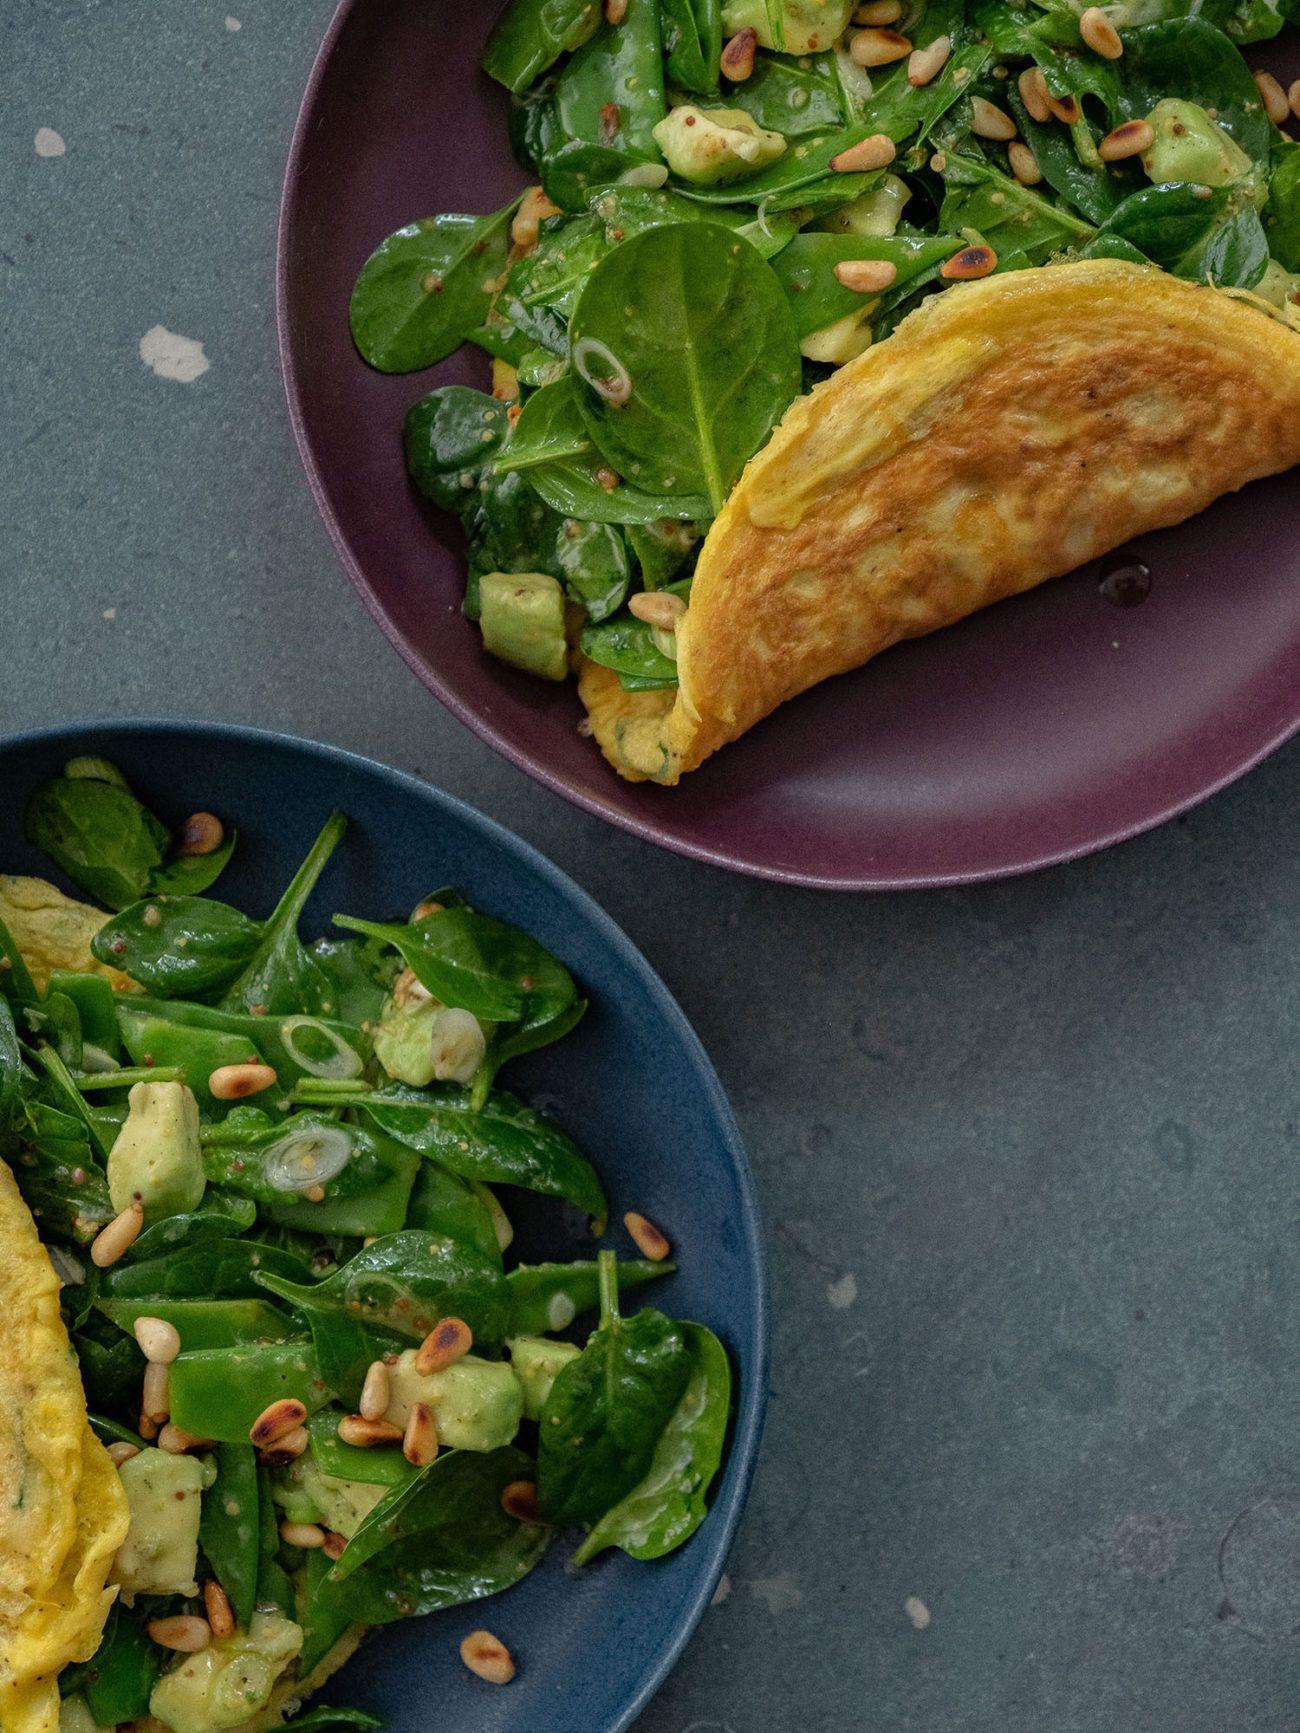 Rezept Omelett mit Spinatsalat, Avocado, Teller, Salat